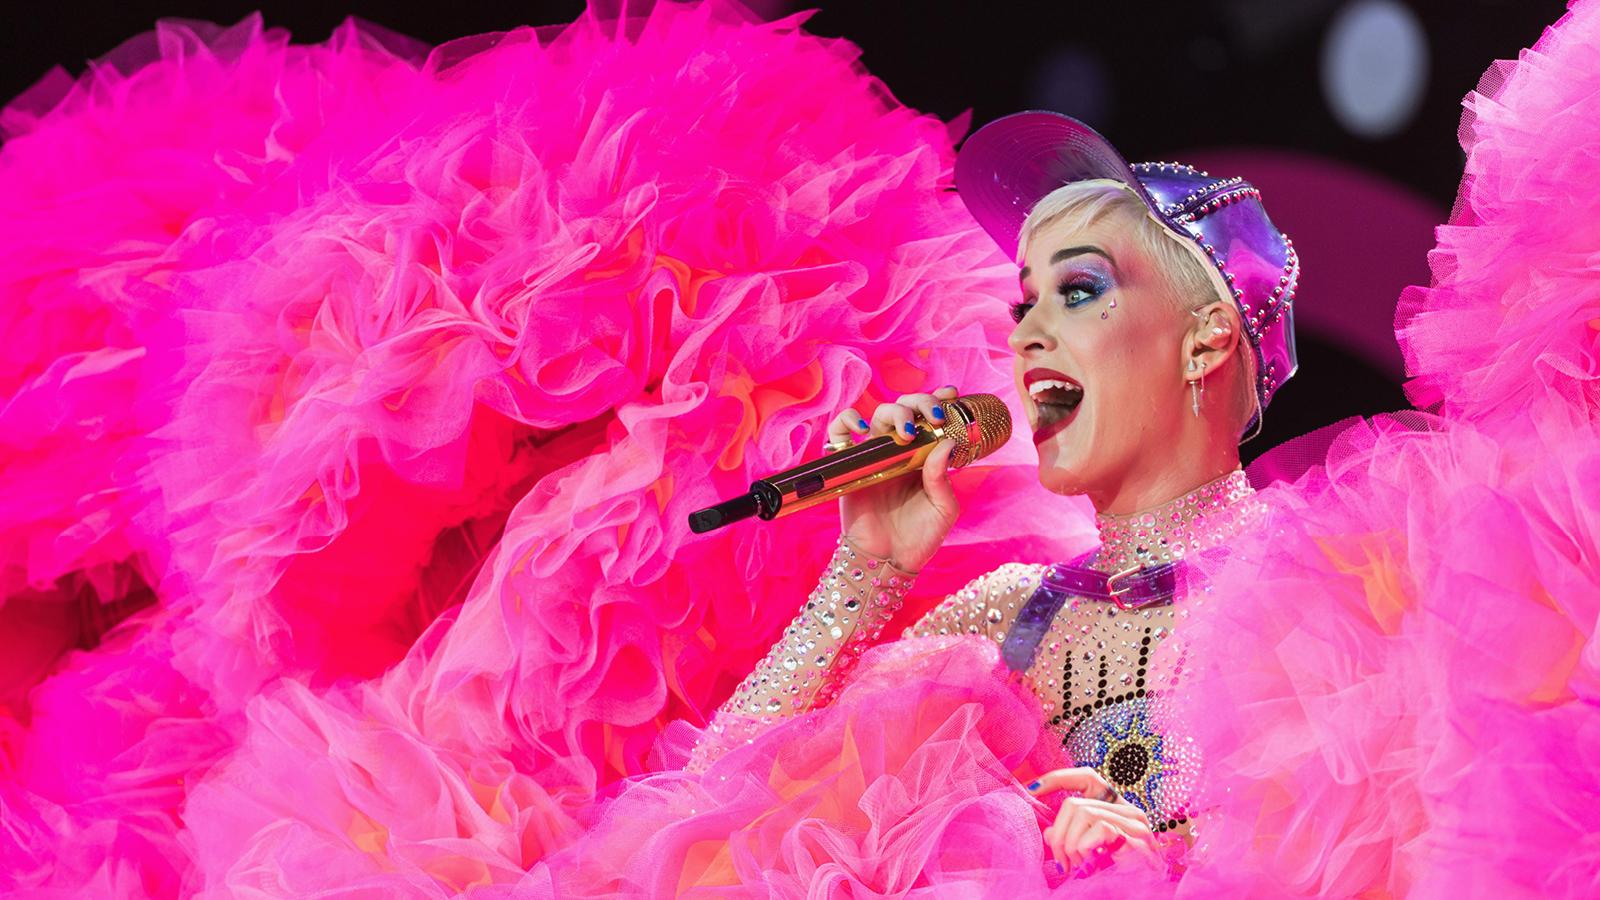 Katy Perry Swish Swish Nicki Minaj